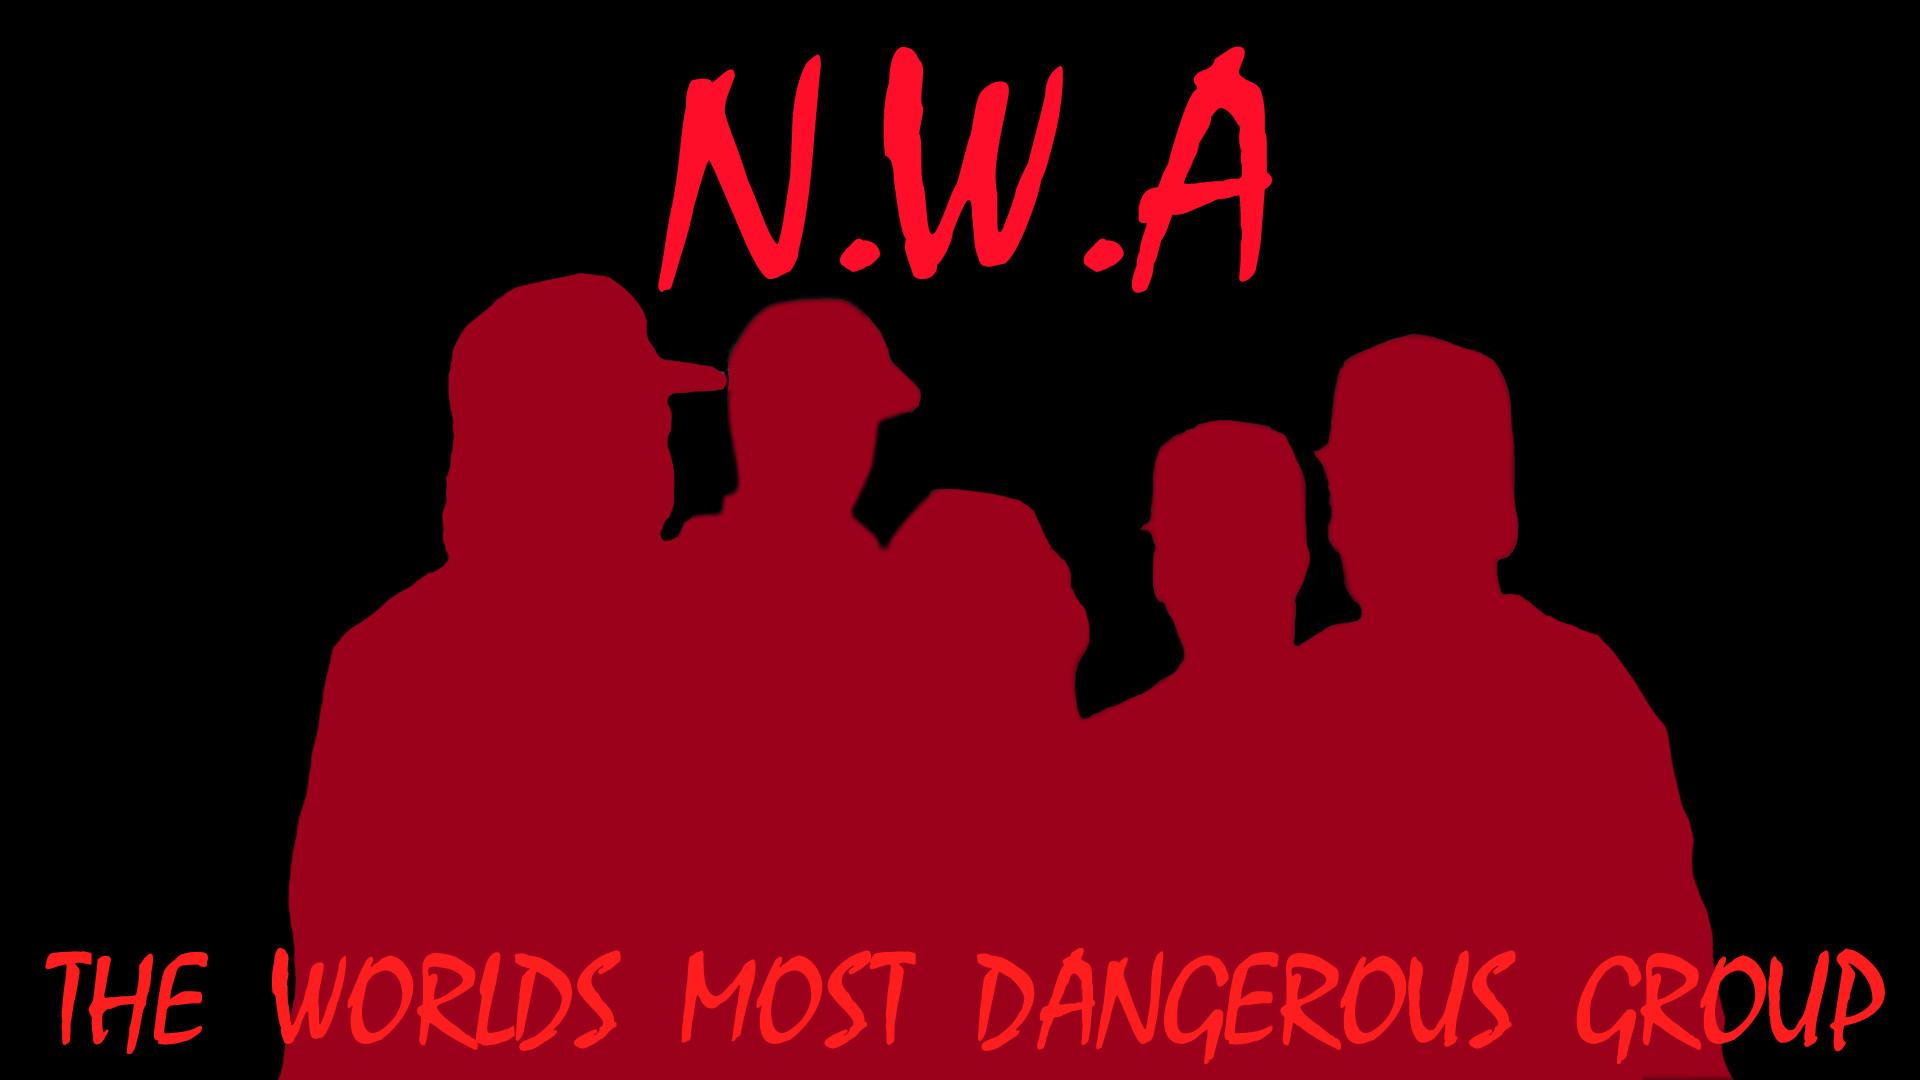 NWA Wallpaper 1080p by TheRealSneakman NWA Wallpaper 1080p by  TheRealSneakman